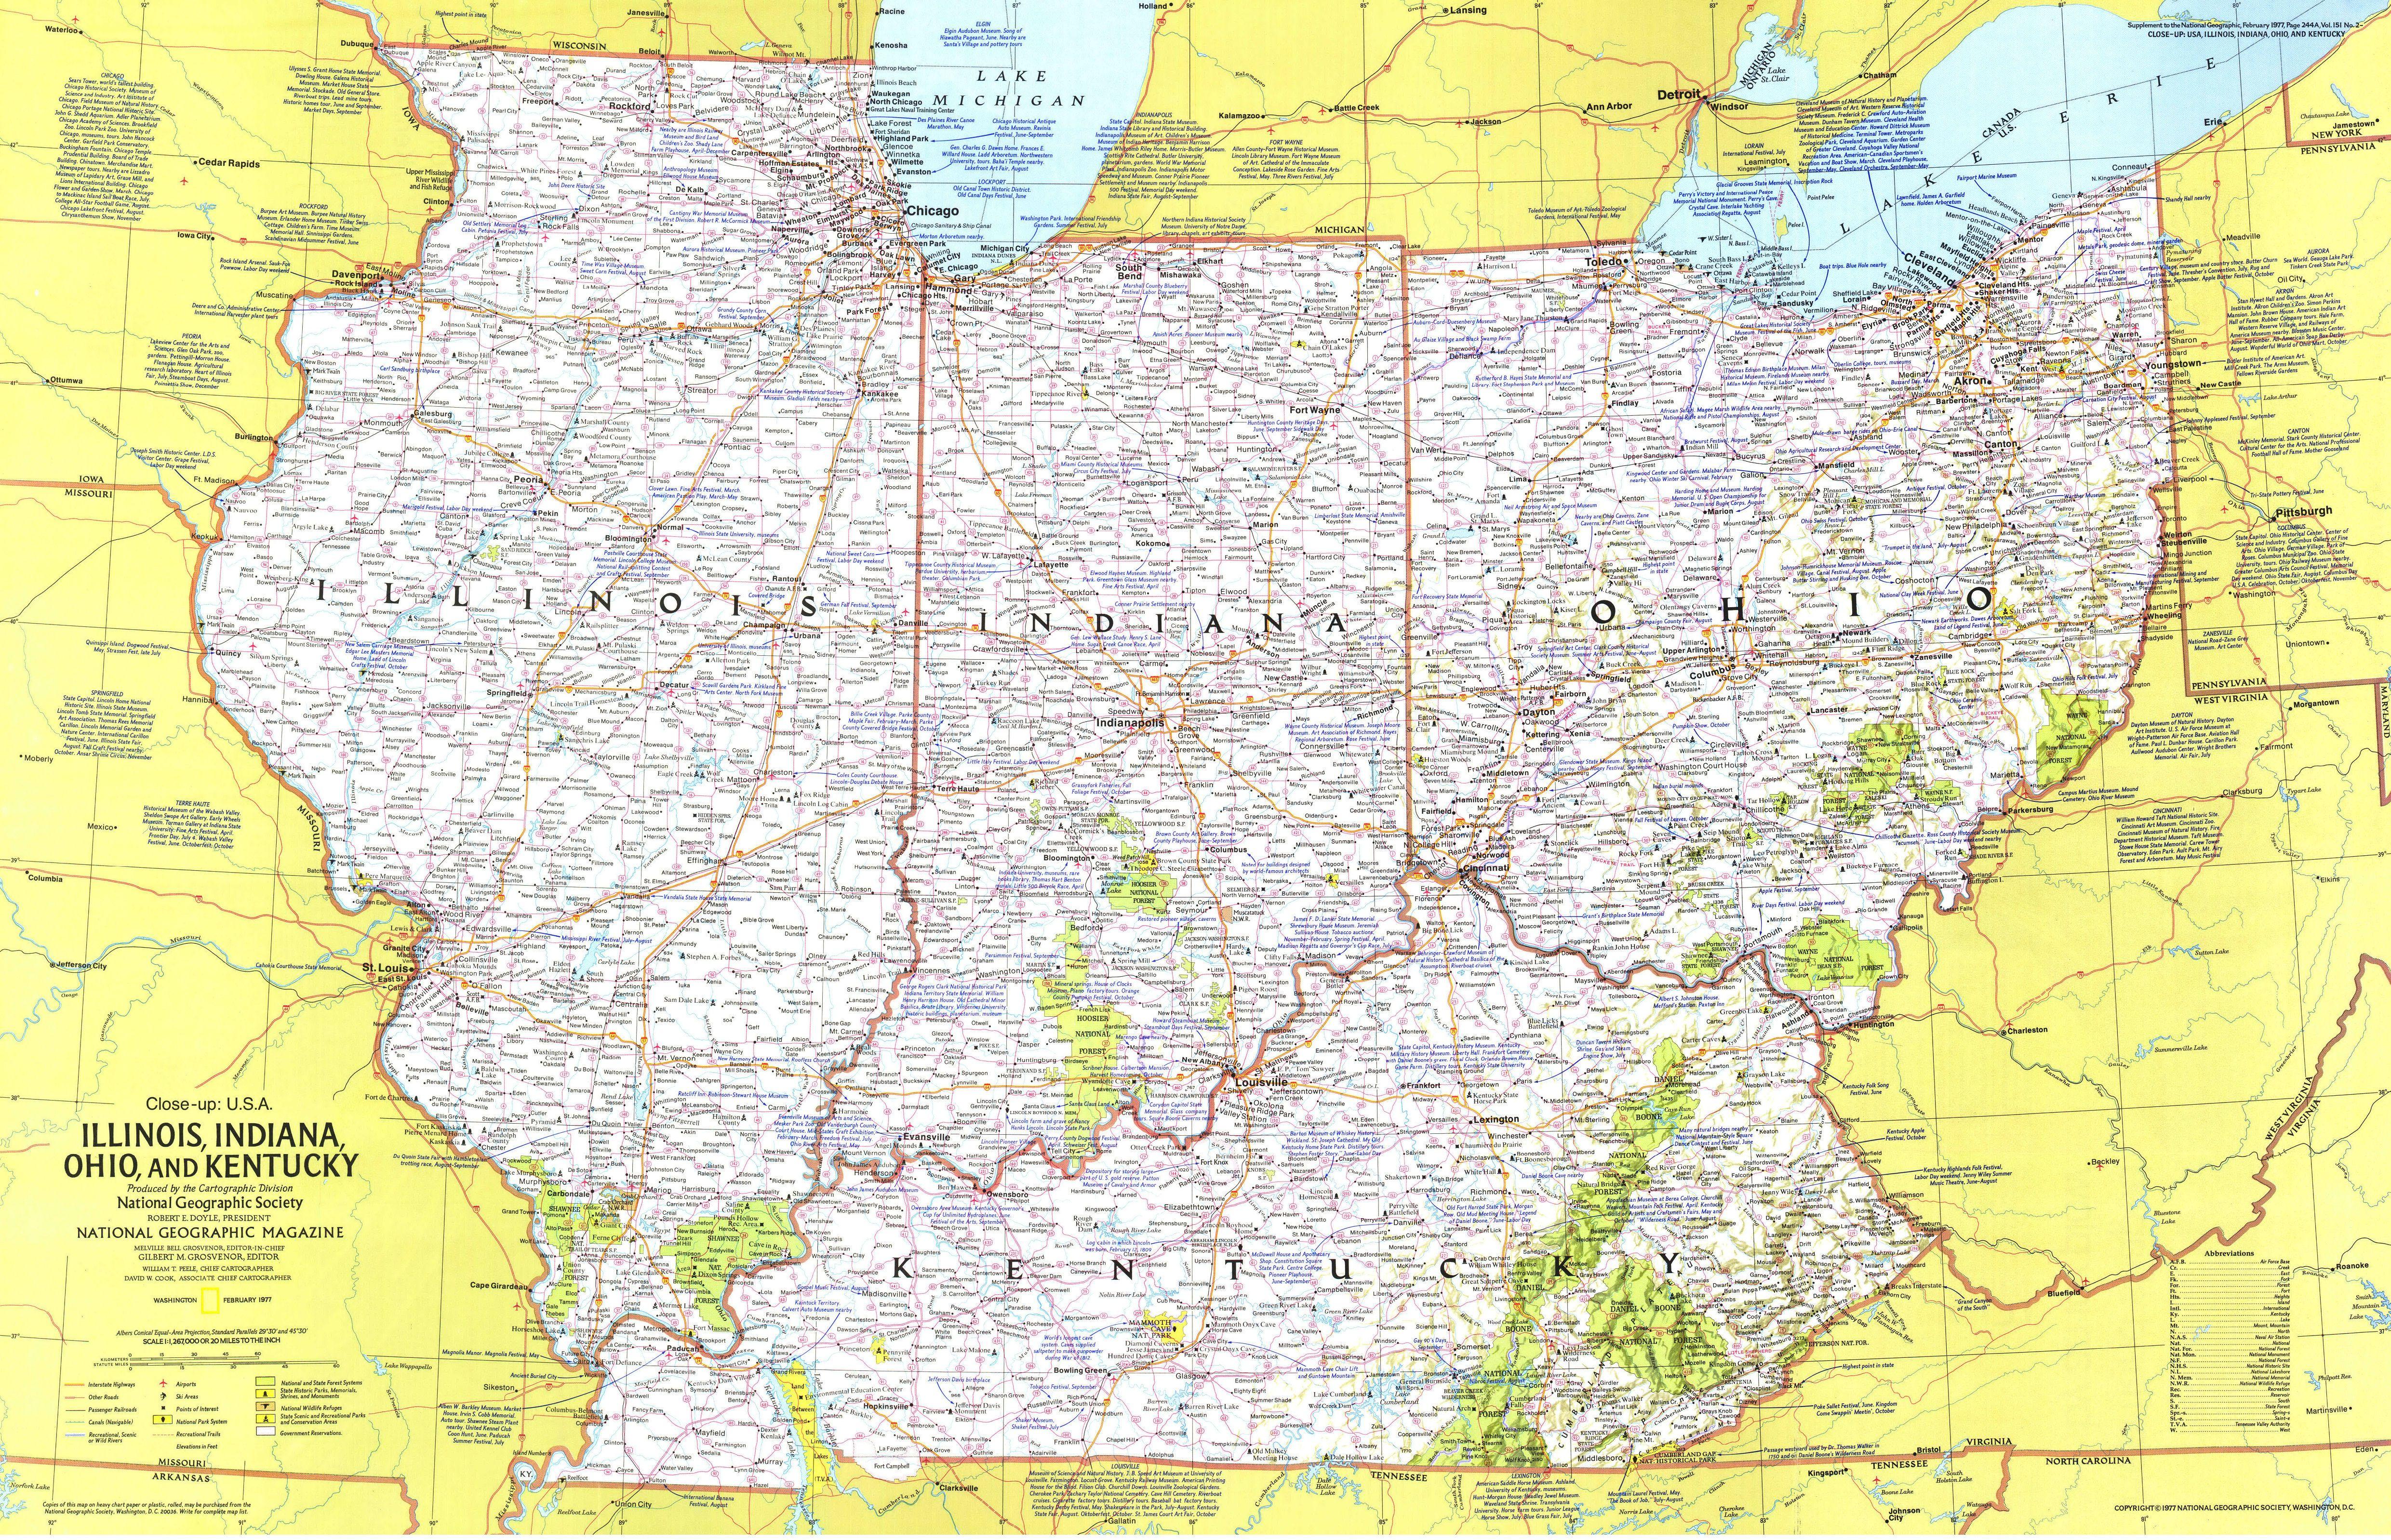 map of ohio kentucky and indiana Illinois Indiana Ohio Kentucky Map Has A 4961 3196 Version map of ohio kentucky and indiana